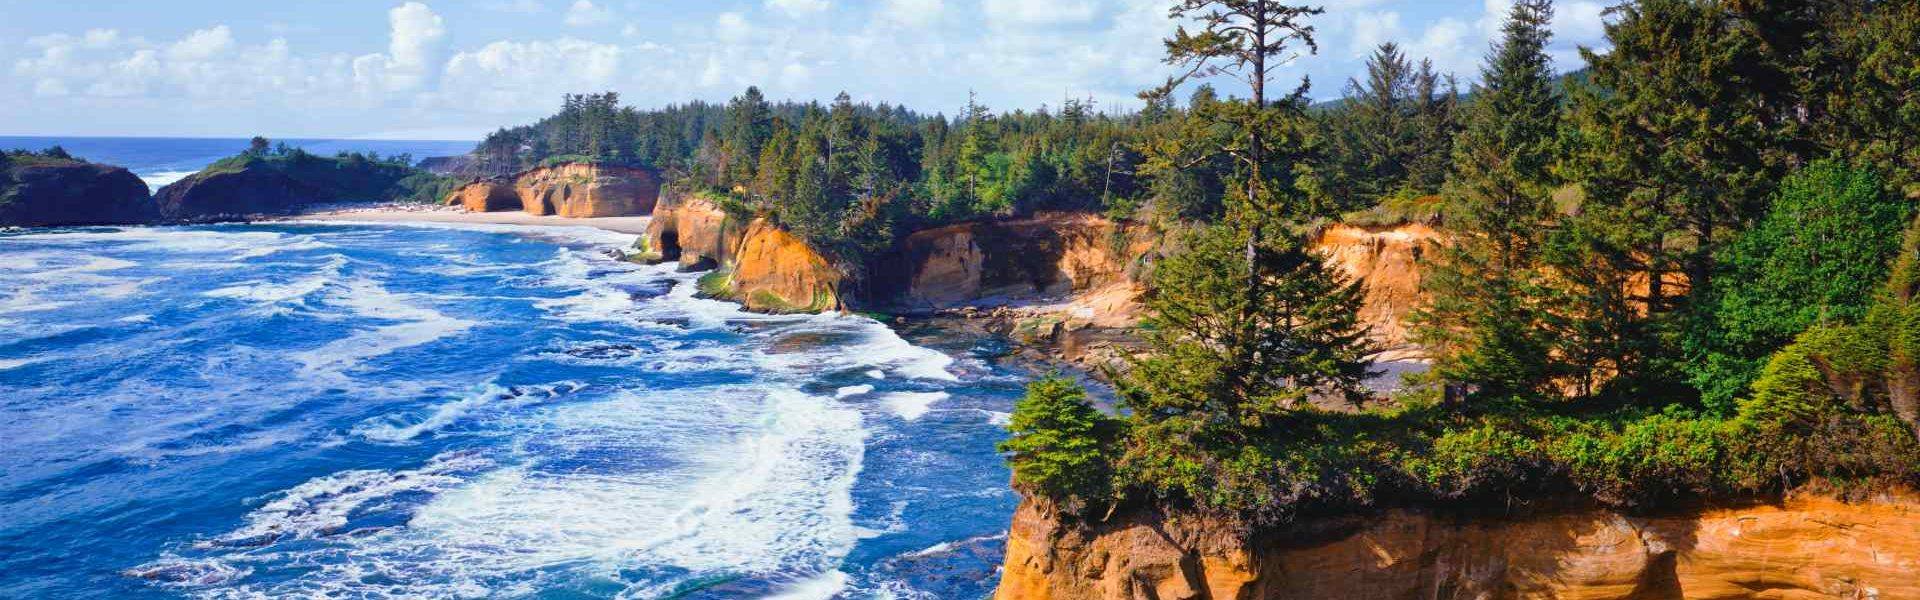 Scenic Oregon Coast